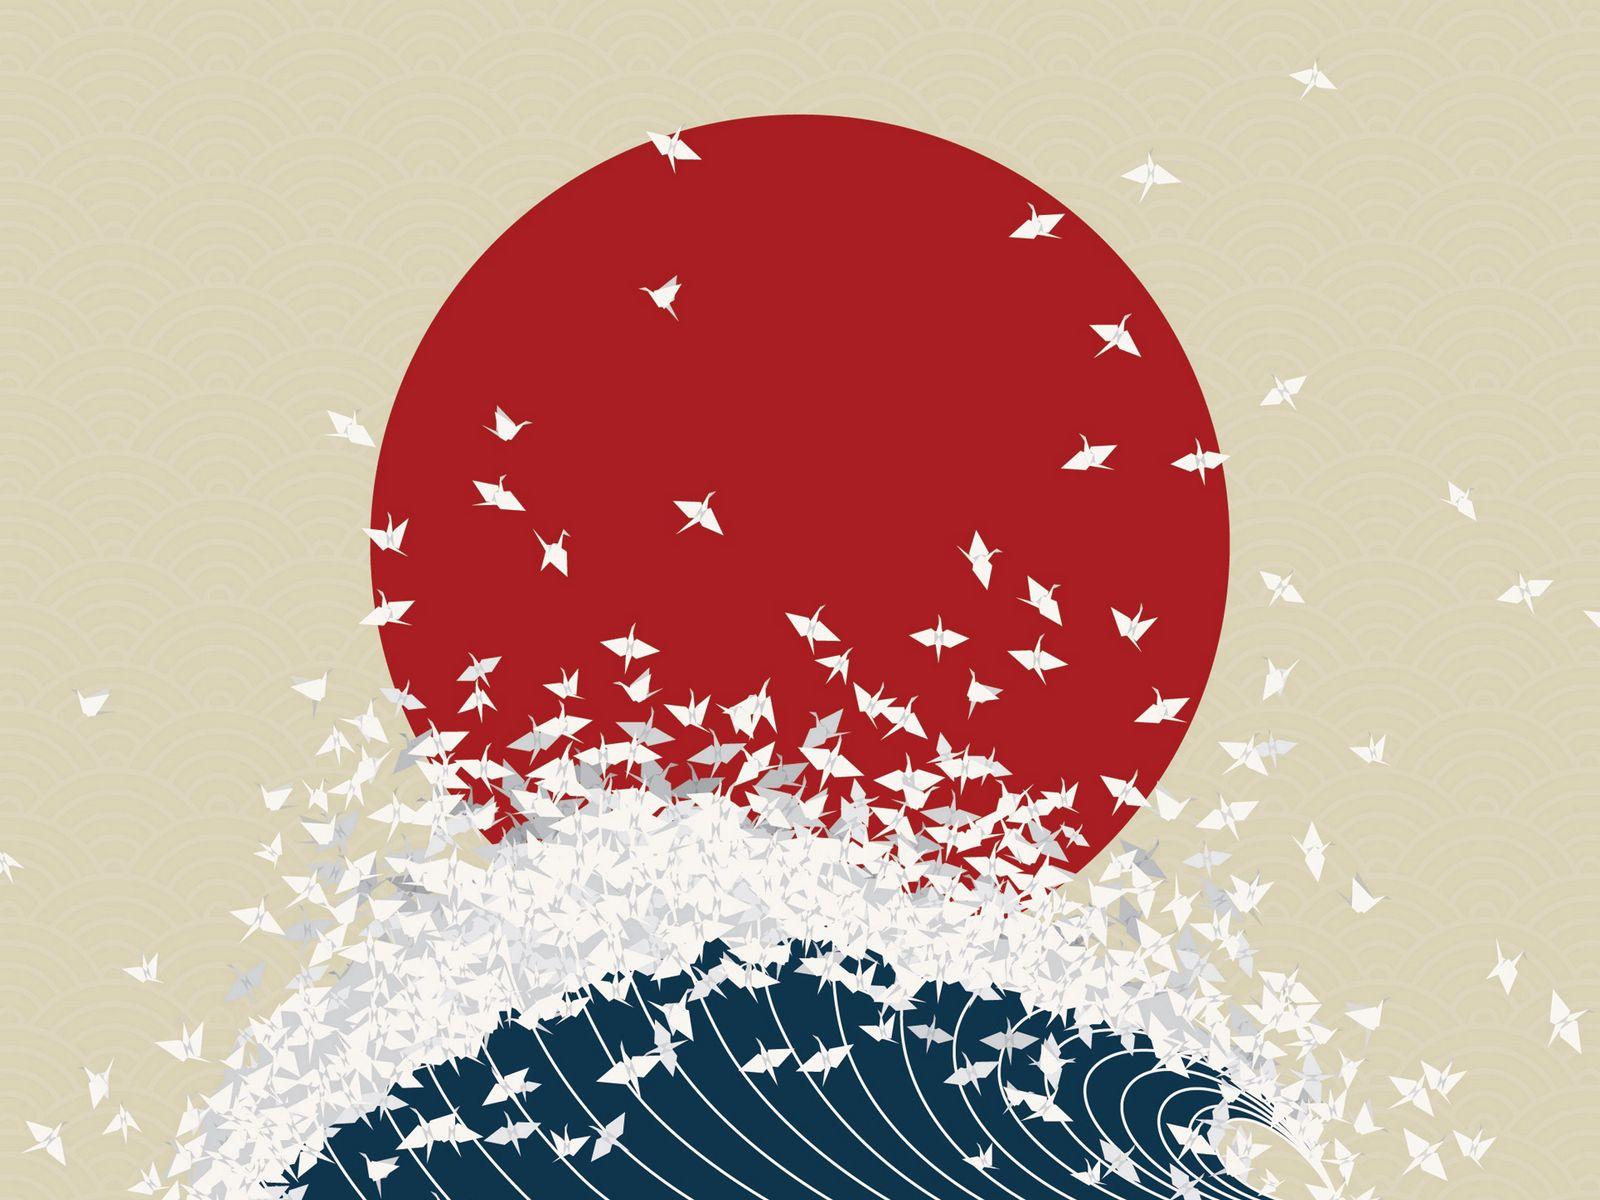 1600x1200 Wallpaper minimalism, origami, japan, rising sun, wave